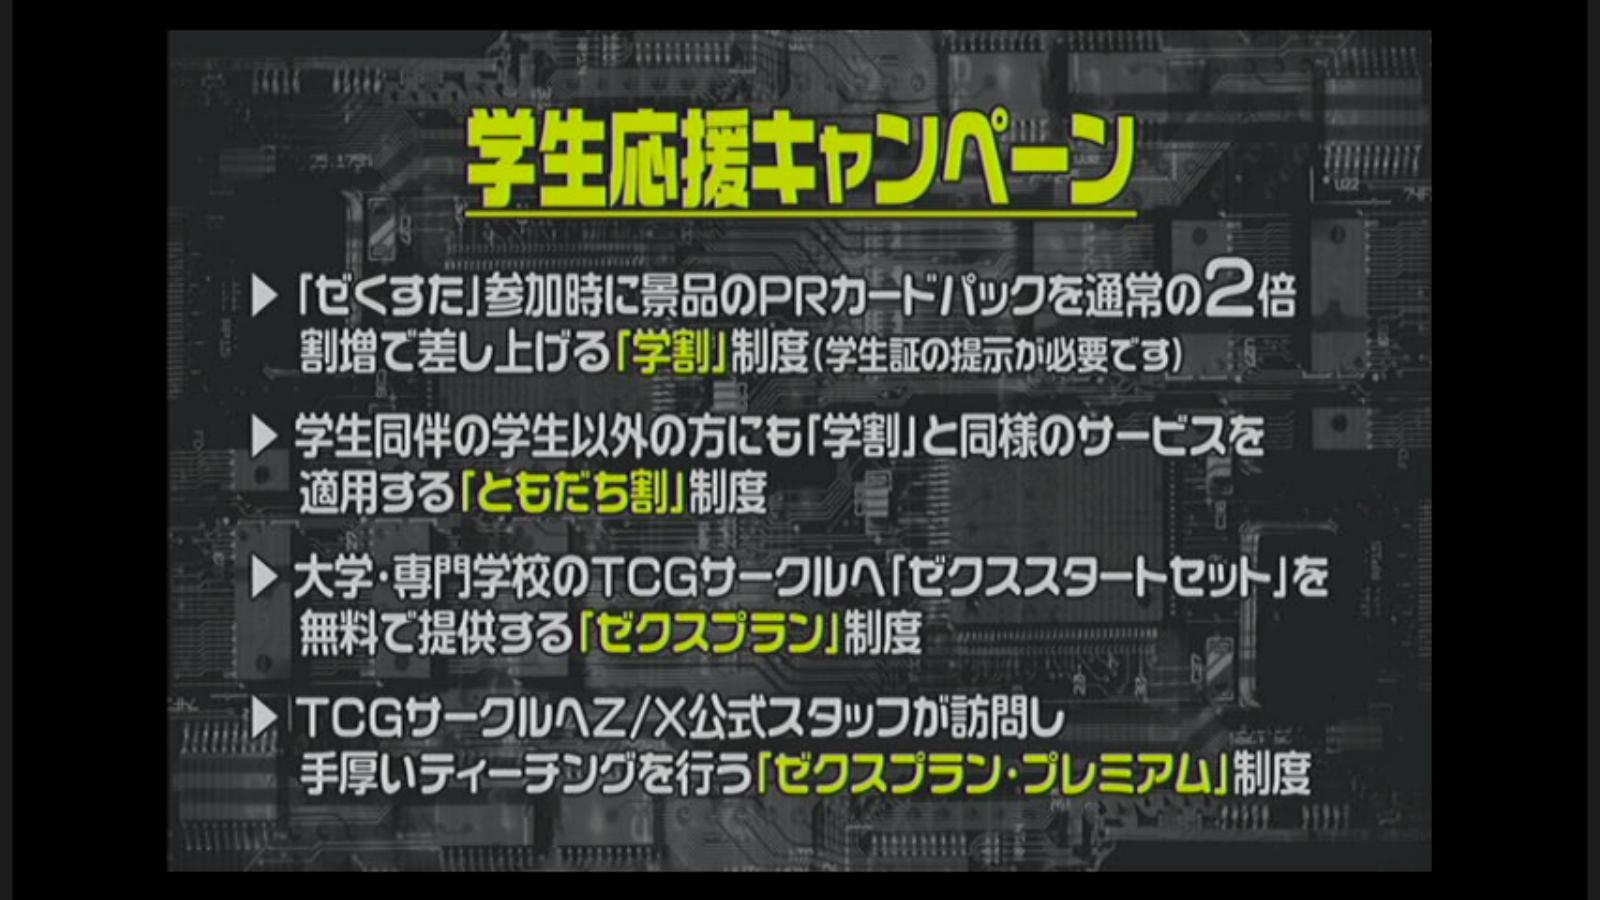 zx-zxtreme-2017spring-20170312-038.jpg